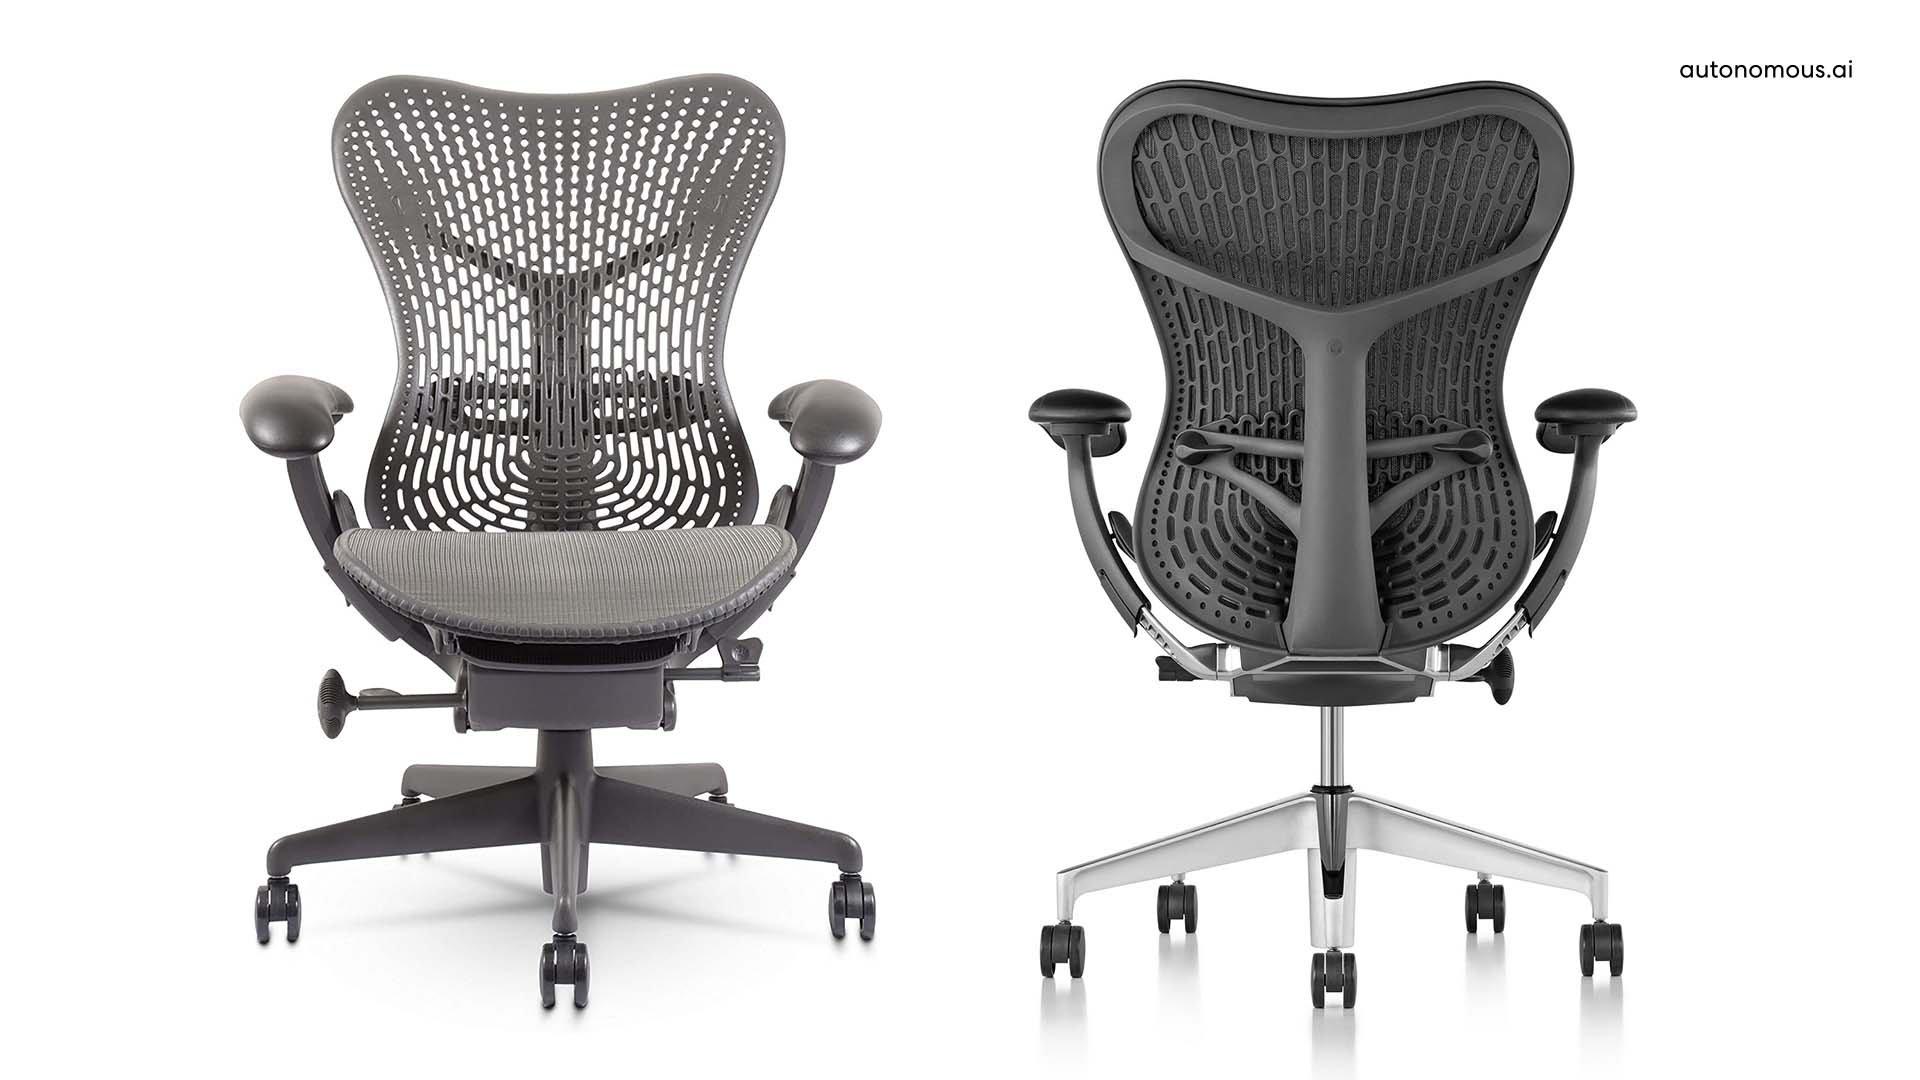 Mirra Chair from Herman Miller